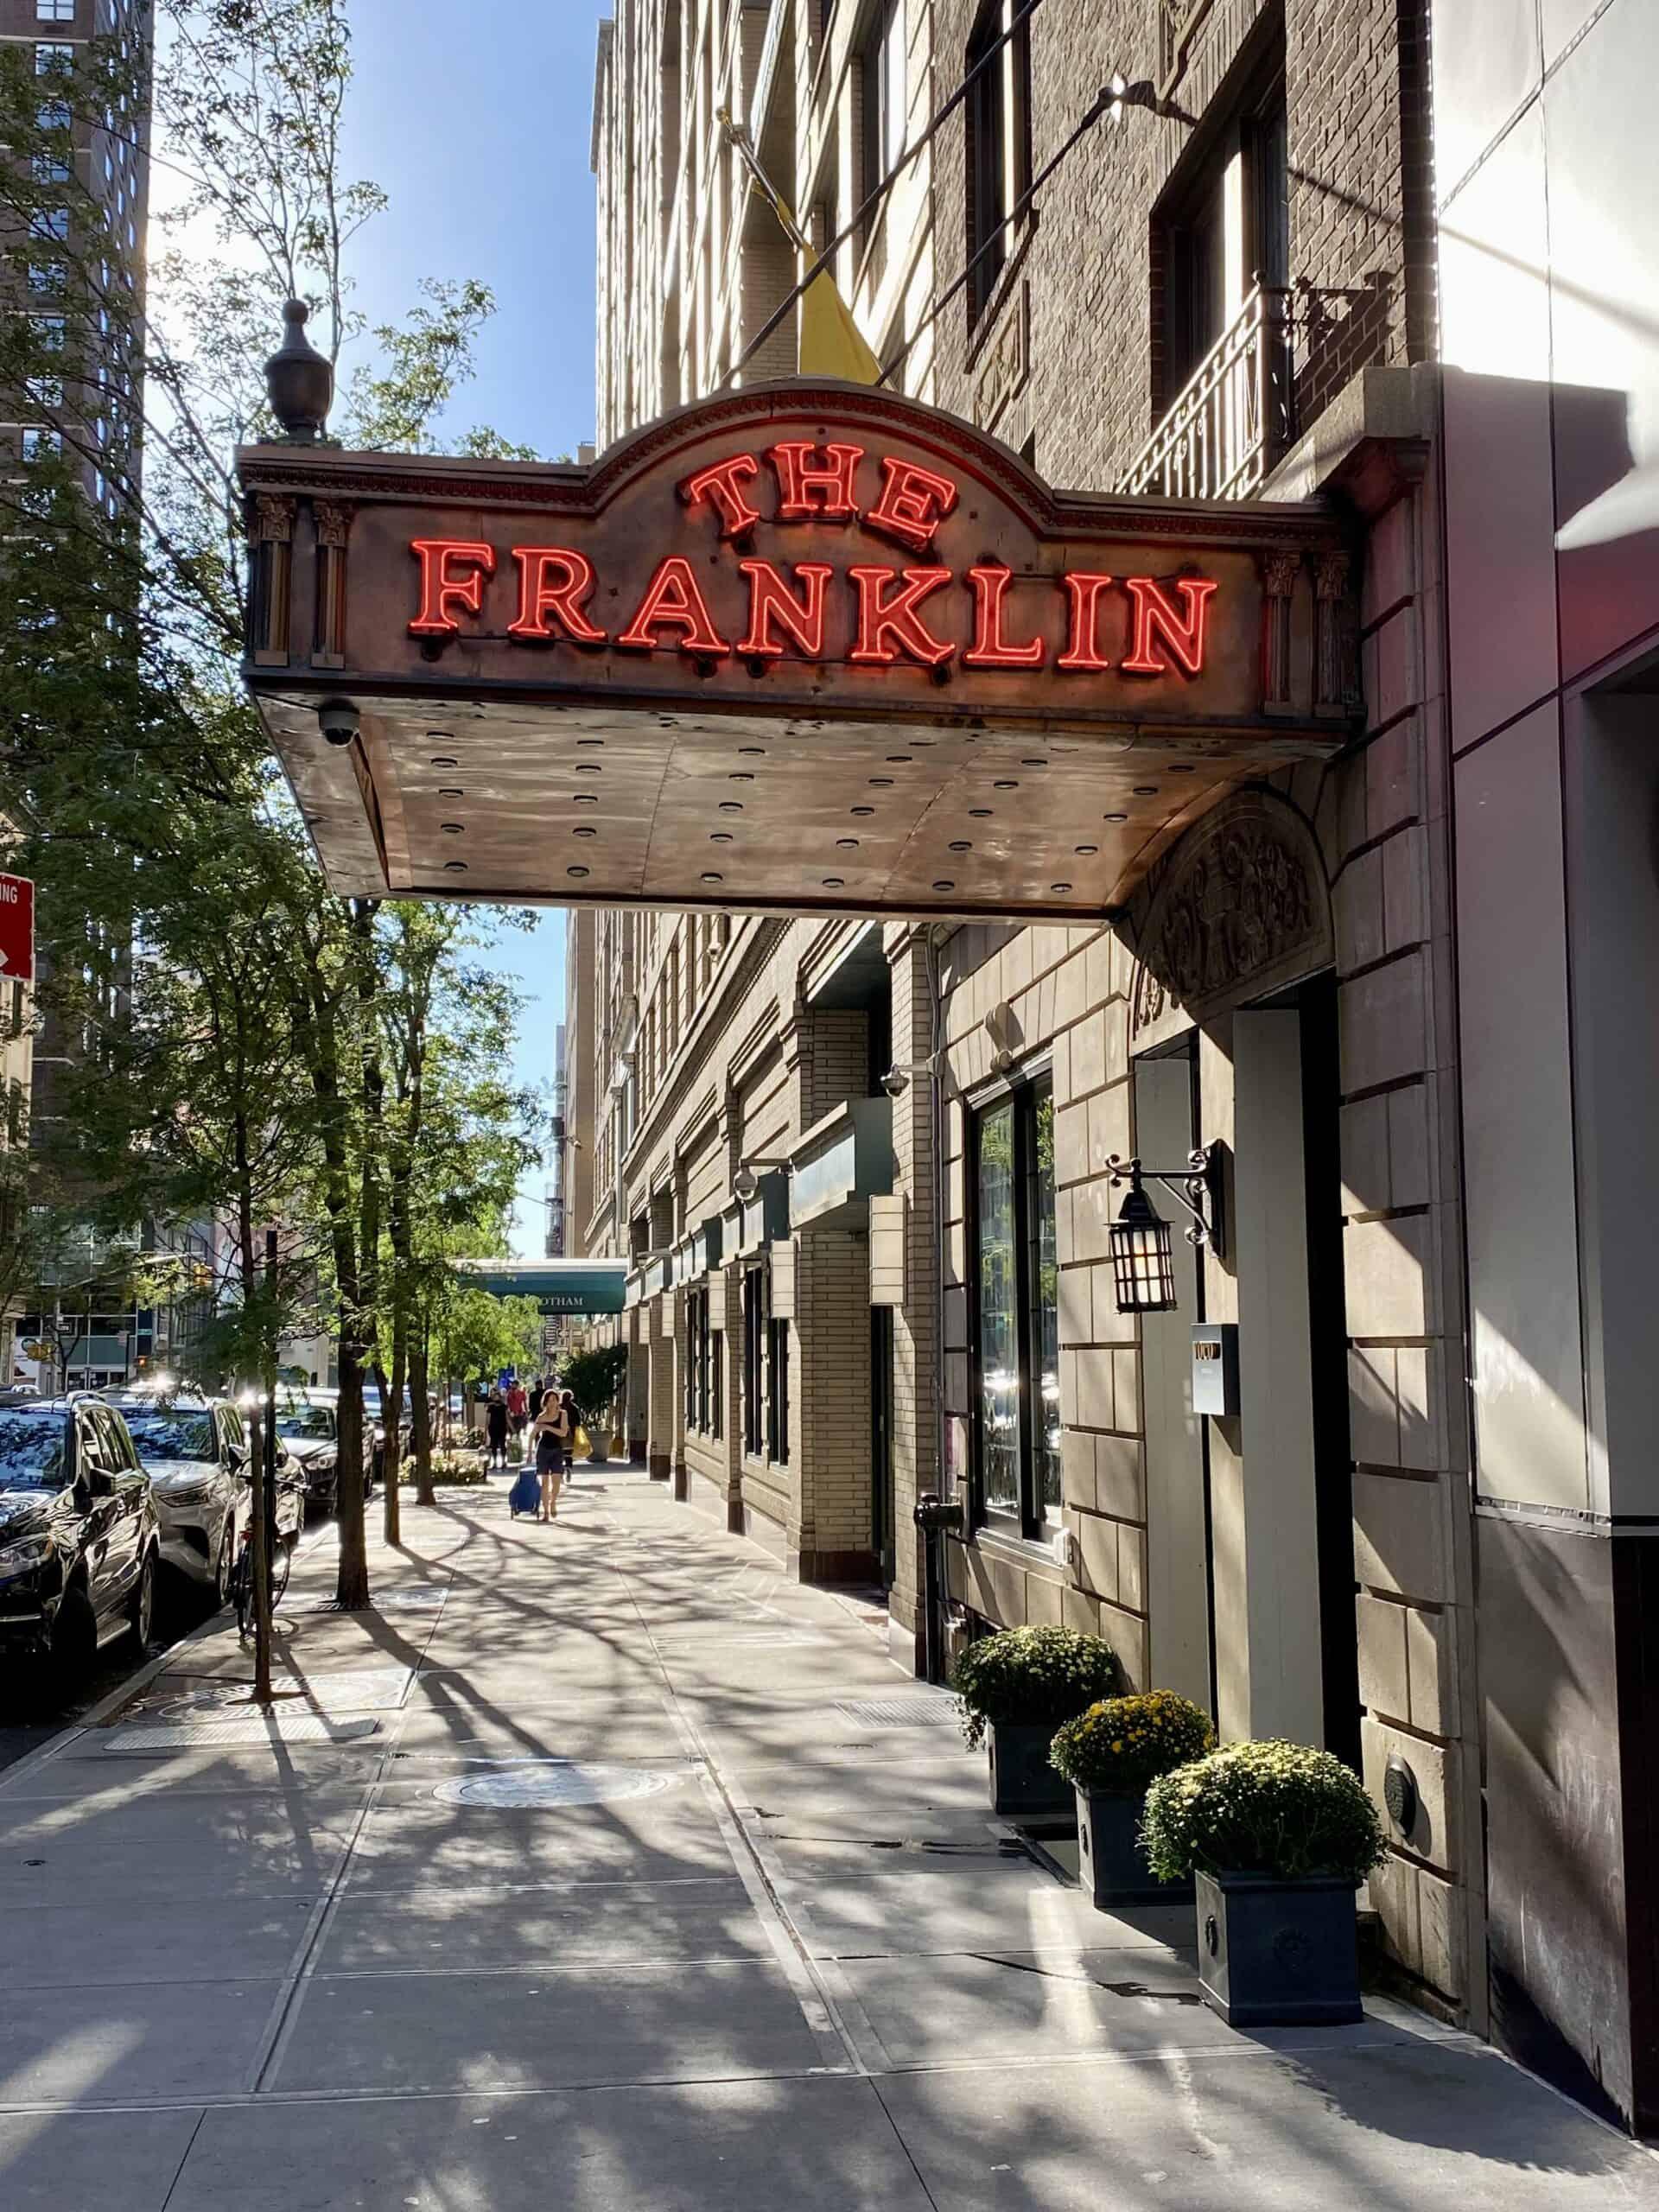 The Franklin entrance in upper east side hotel in Manhattan